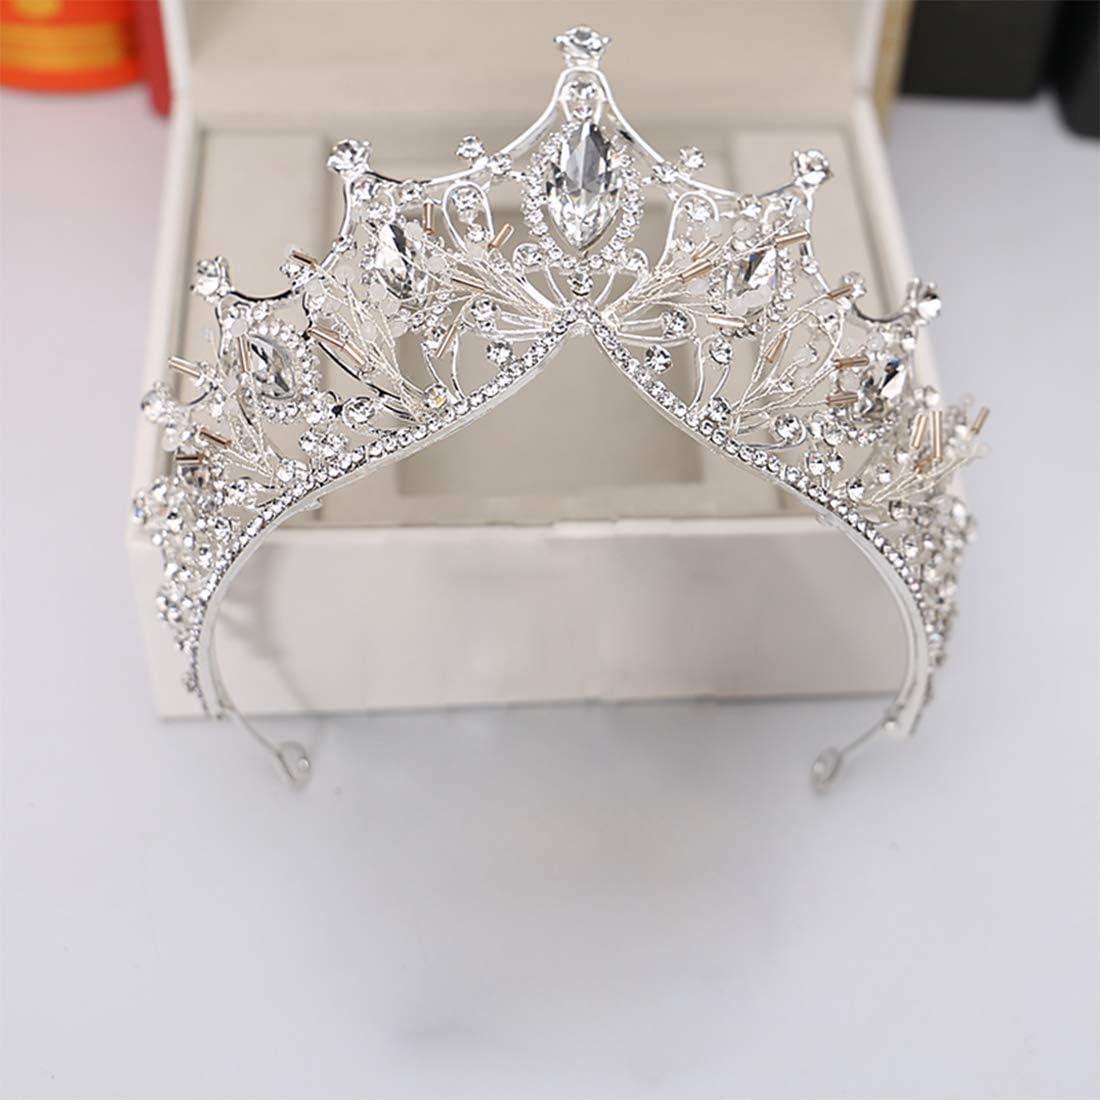 Gold Crown+Earring Wedding Crown for Bride Rhinestone Princess tiara for Women Prom Queen Crown Pageant-Bridal Wedding Crown Handmade Hair Accessories Rose Gold Crown